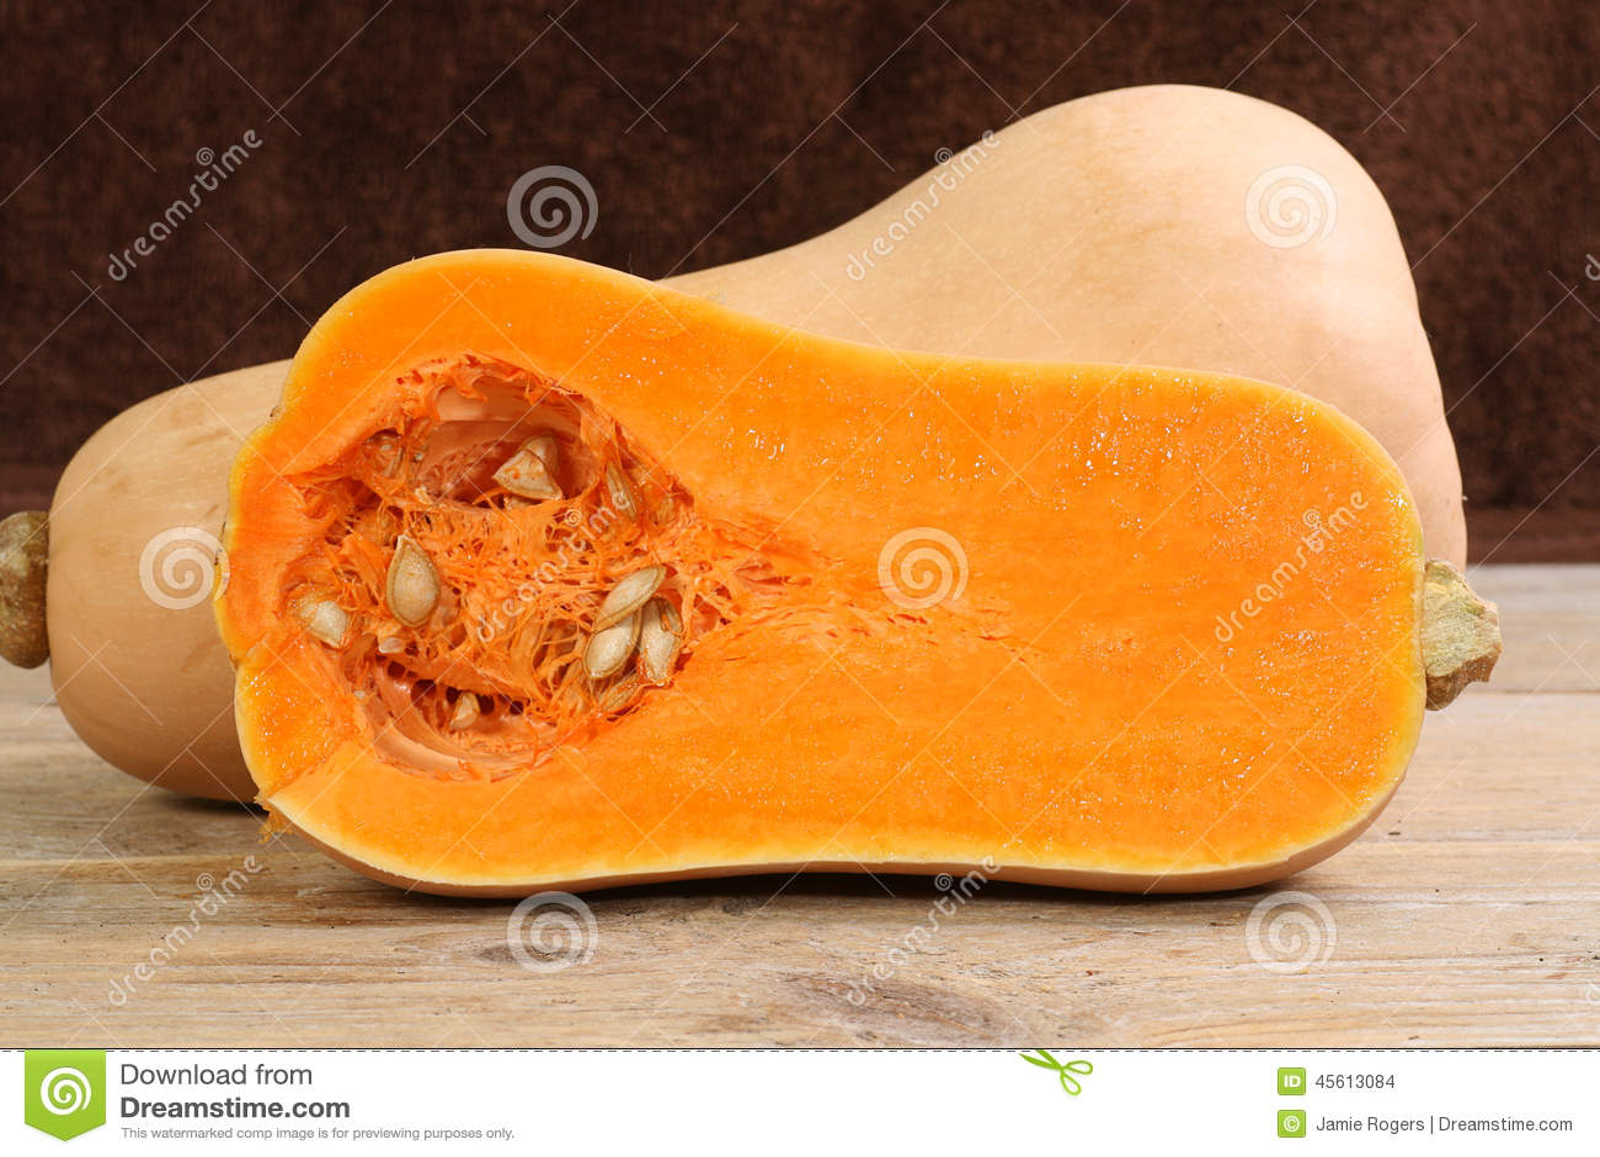 Halved butternut squash